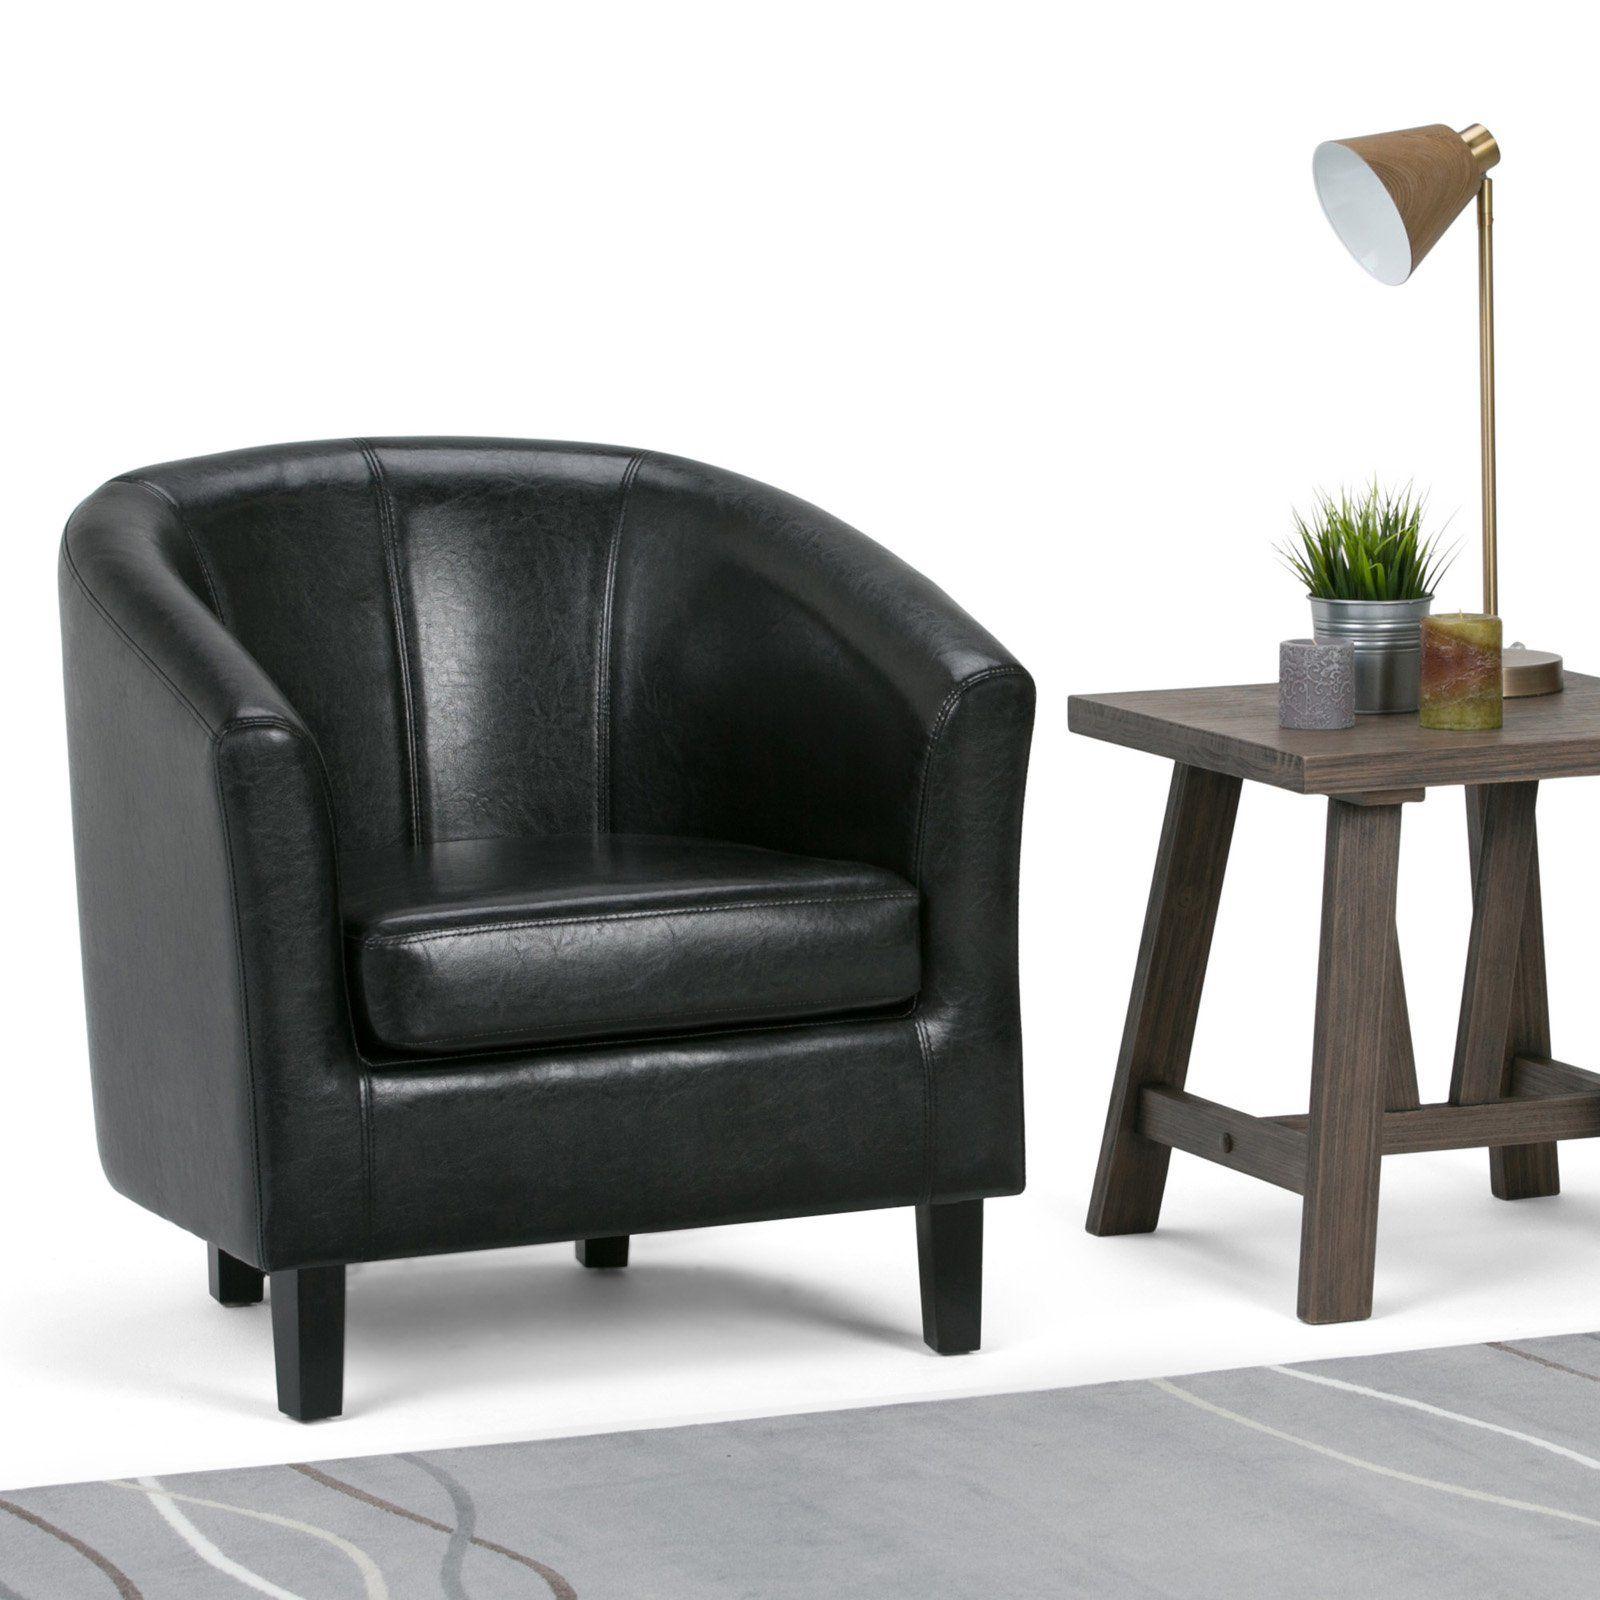 Brooklyn + Max Hudson Faux Leather Barrel Chair In 2020 Within Liam Faux Leather Barrel Chairs (View 10 of 15)